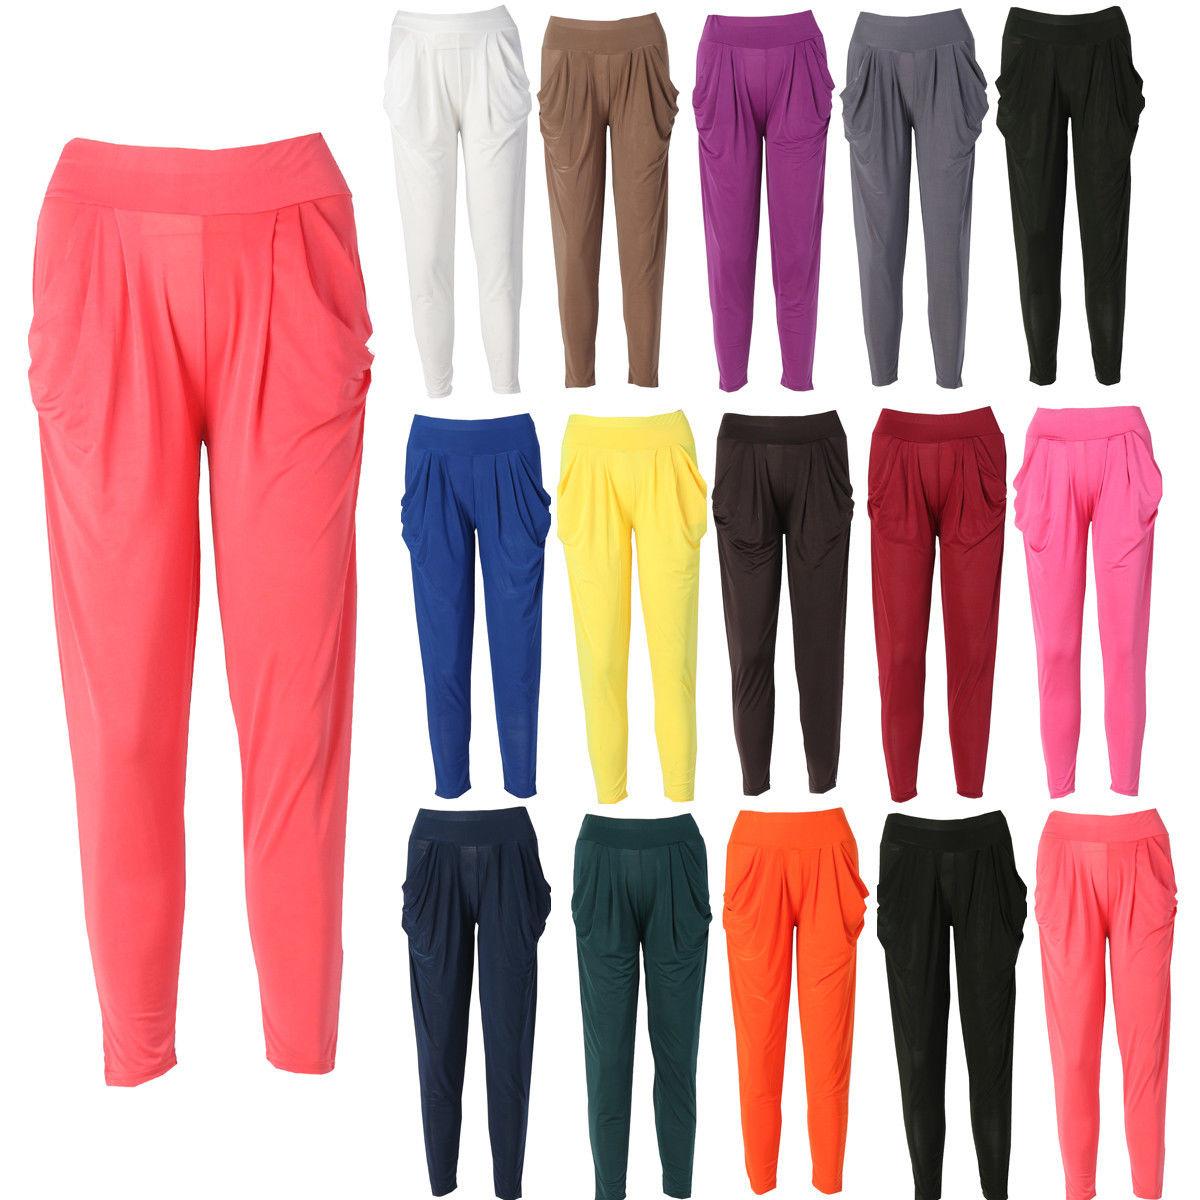 New Hot Women Fashion Solid Color Long Pants Legging Trouser High Waist Elasticity Harem Baggy Dance